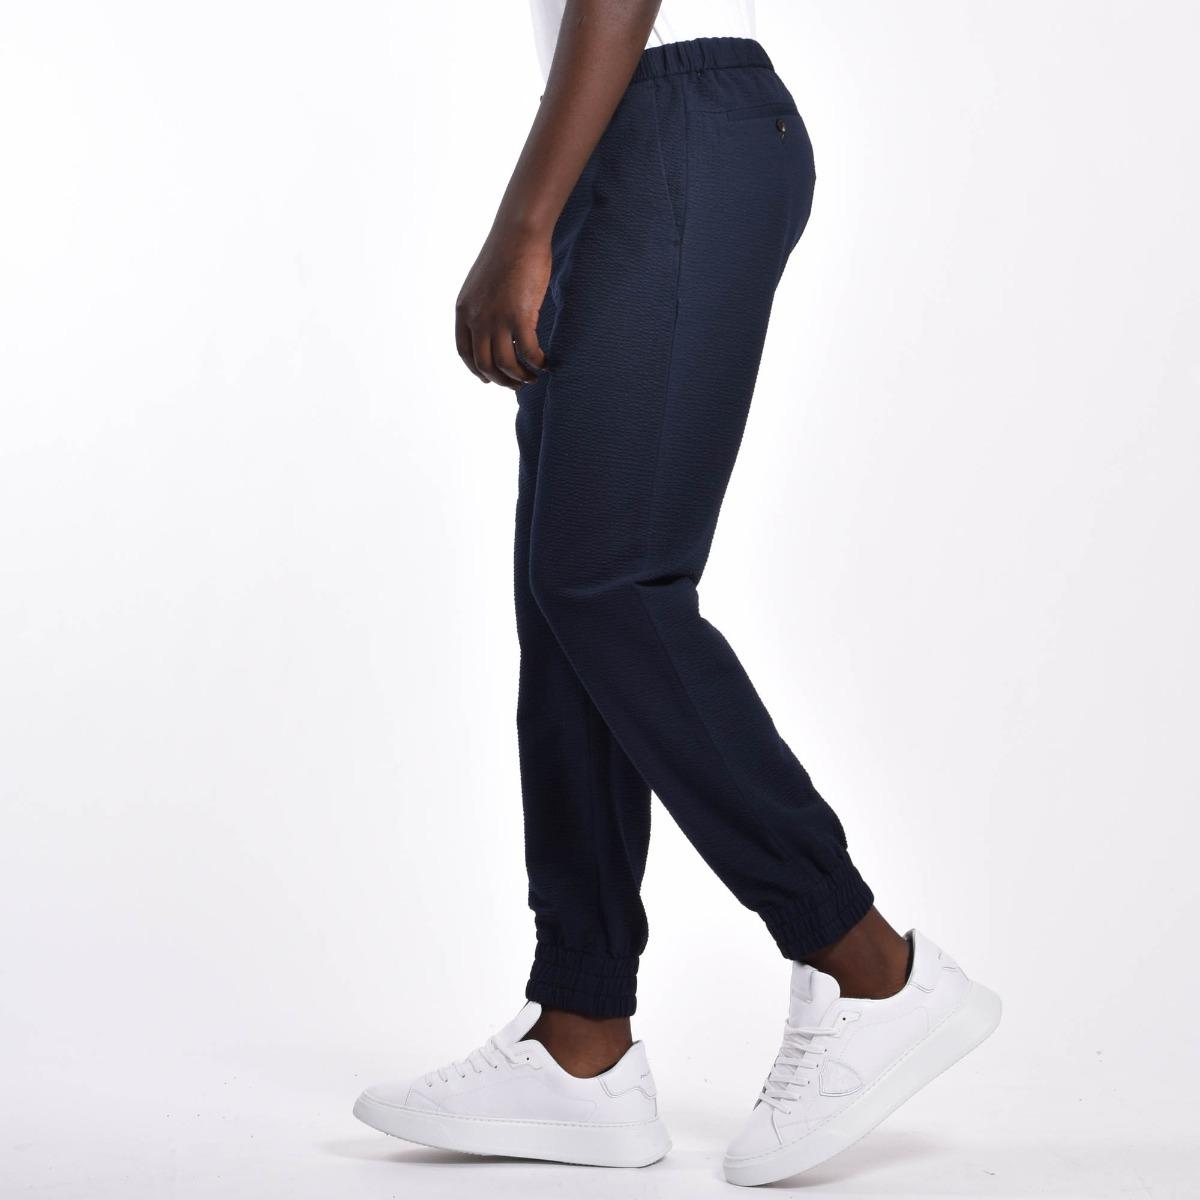 Pantalone jersey con polsino - Blu